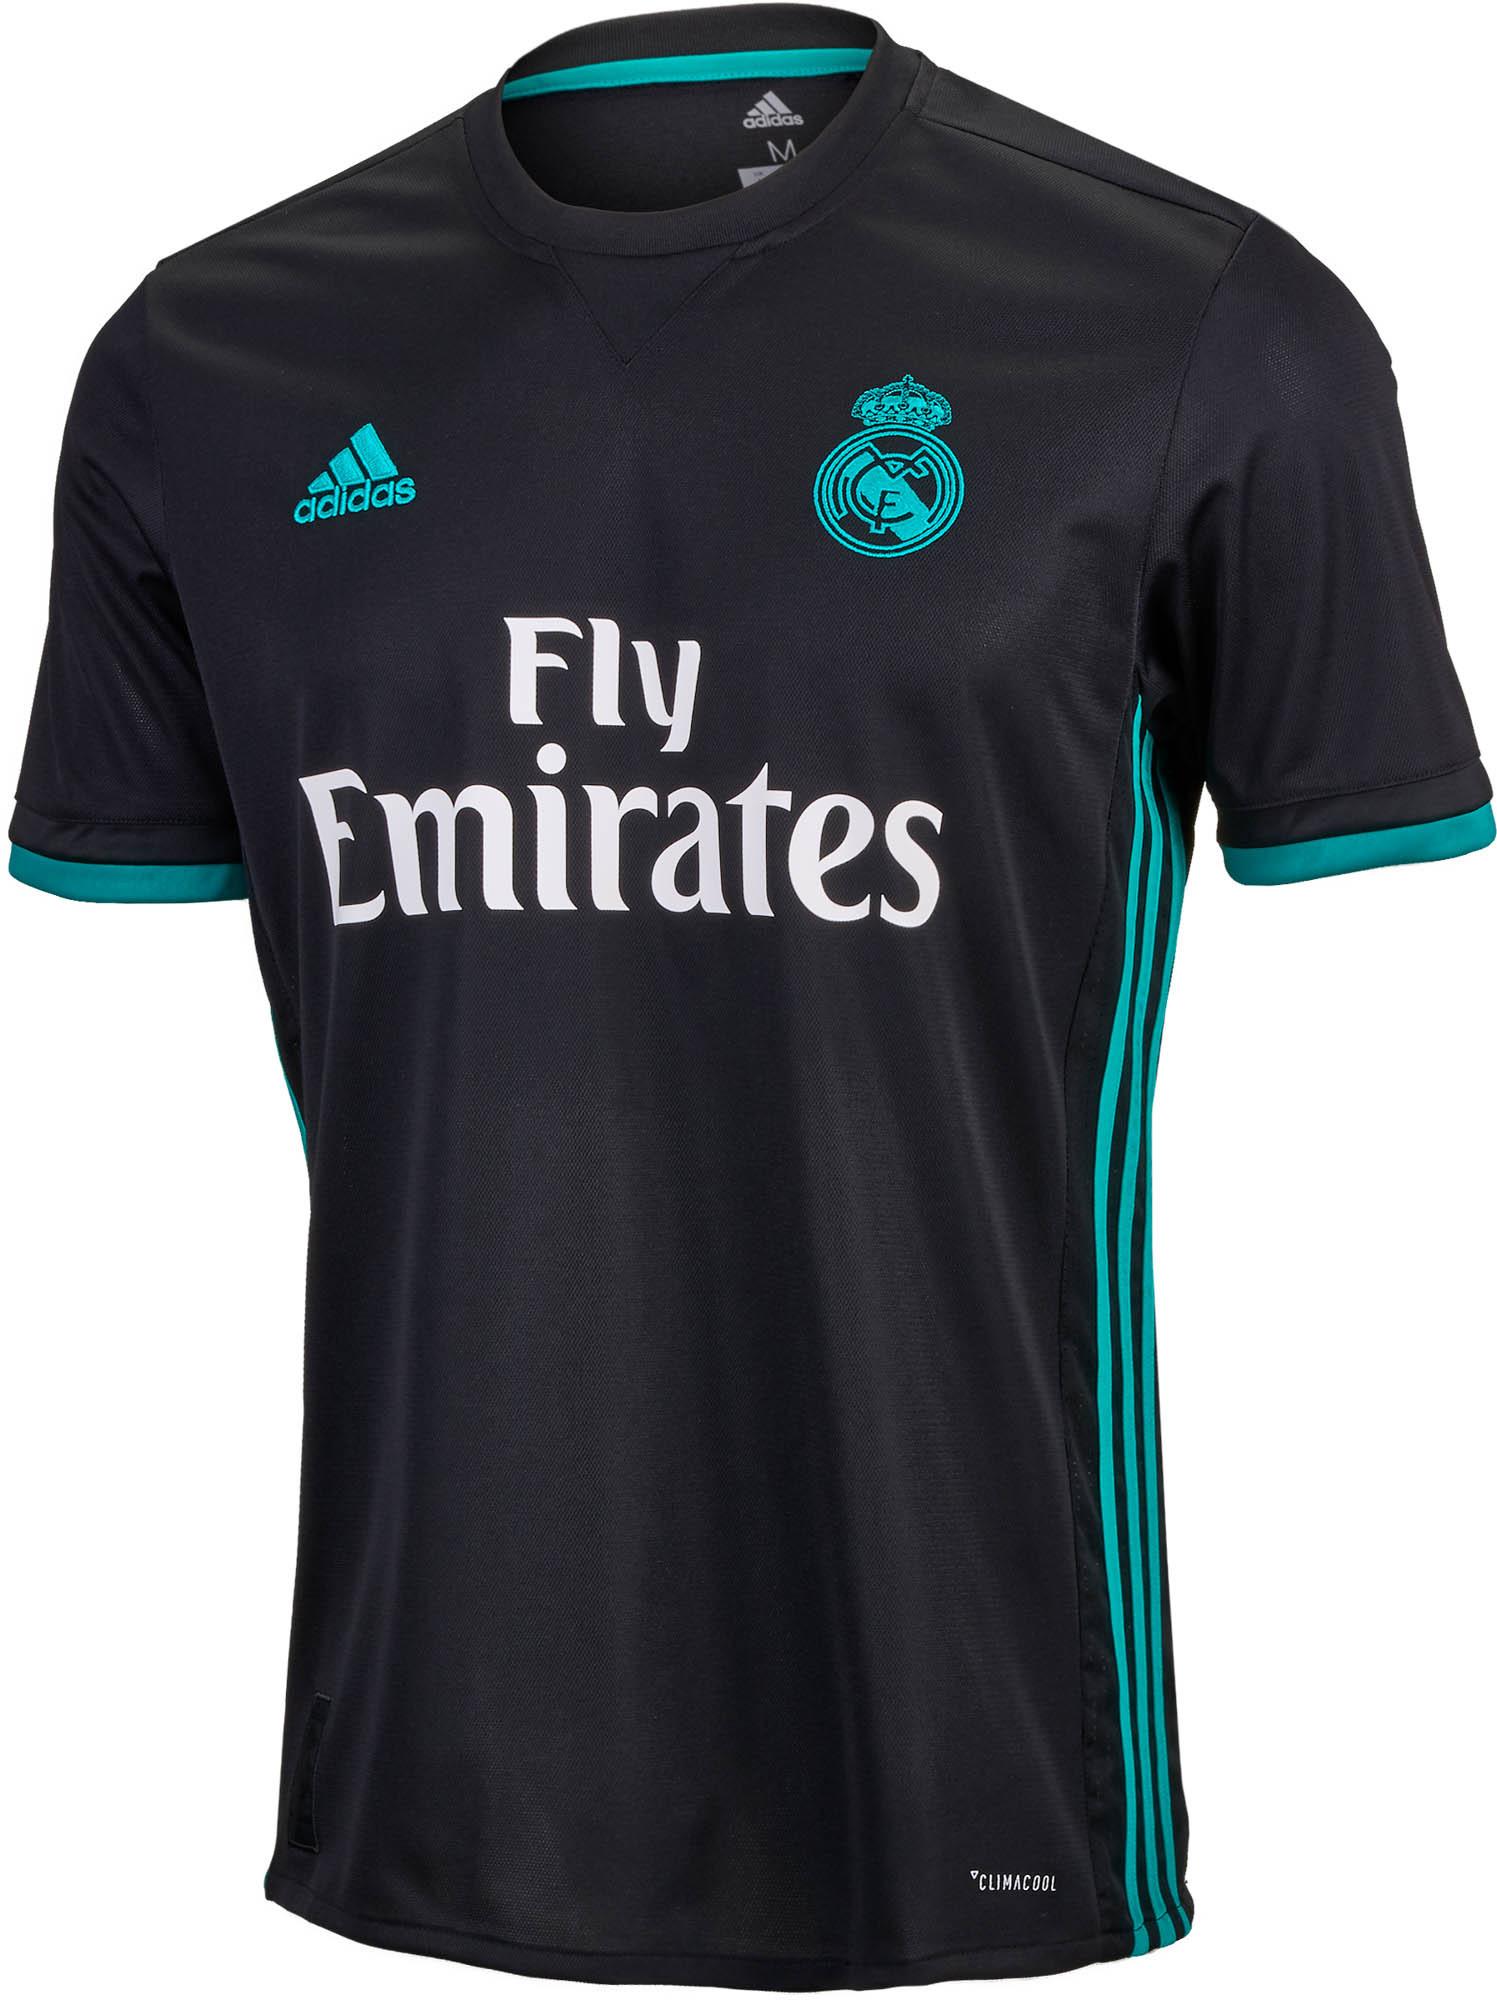 adidas Real Madrid Away Jersey - 2017/18 Soccer Jerseys